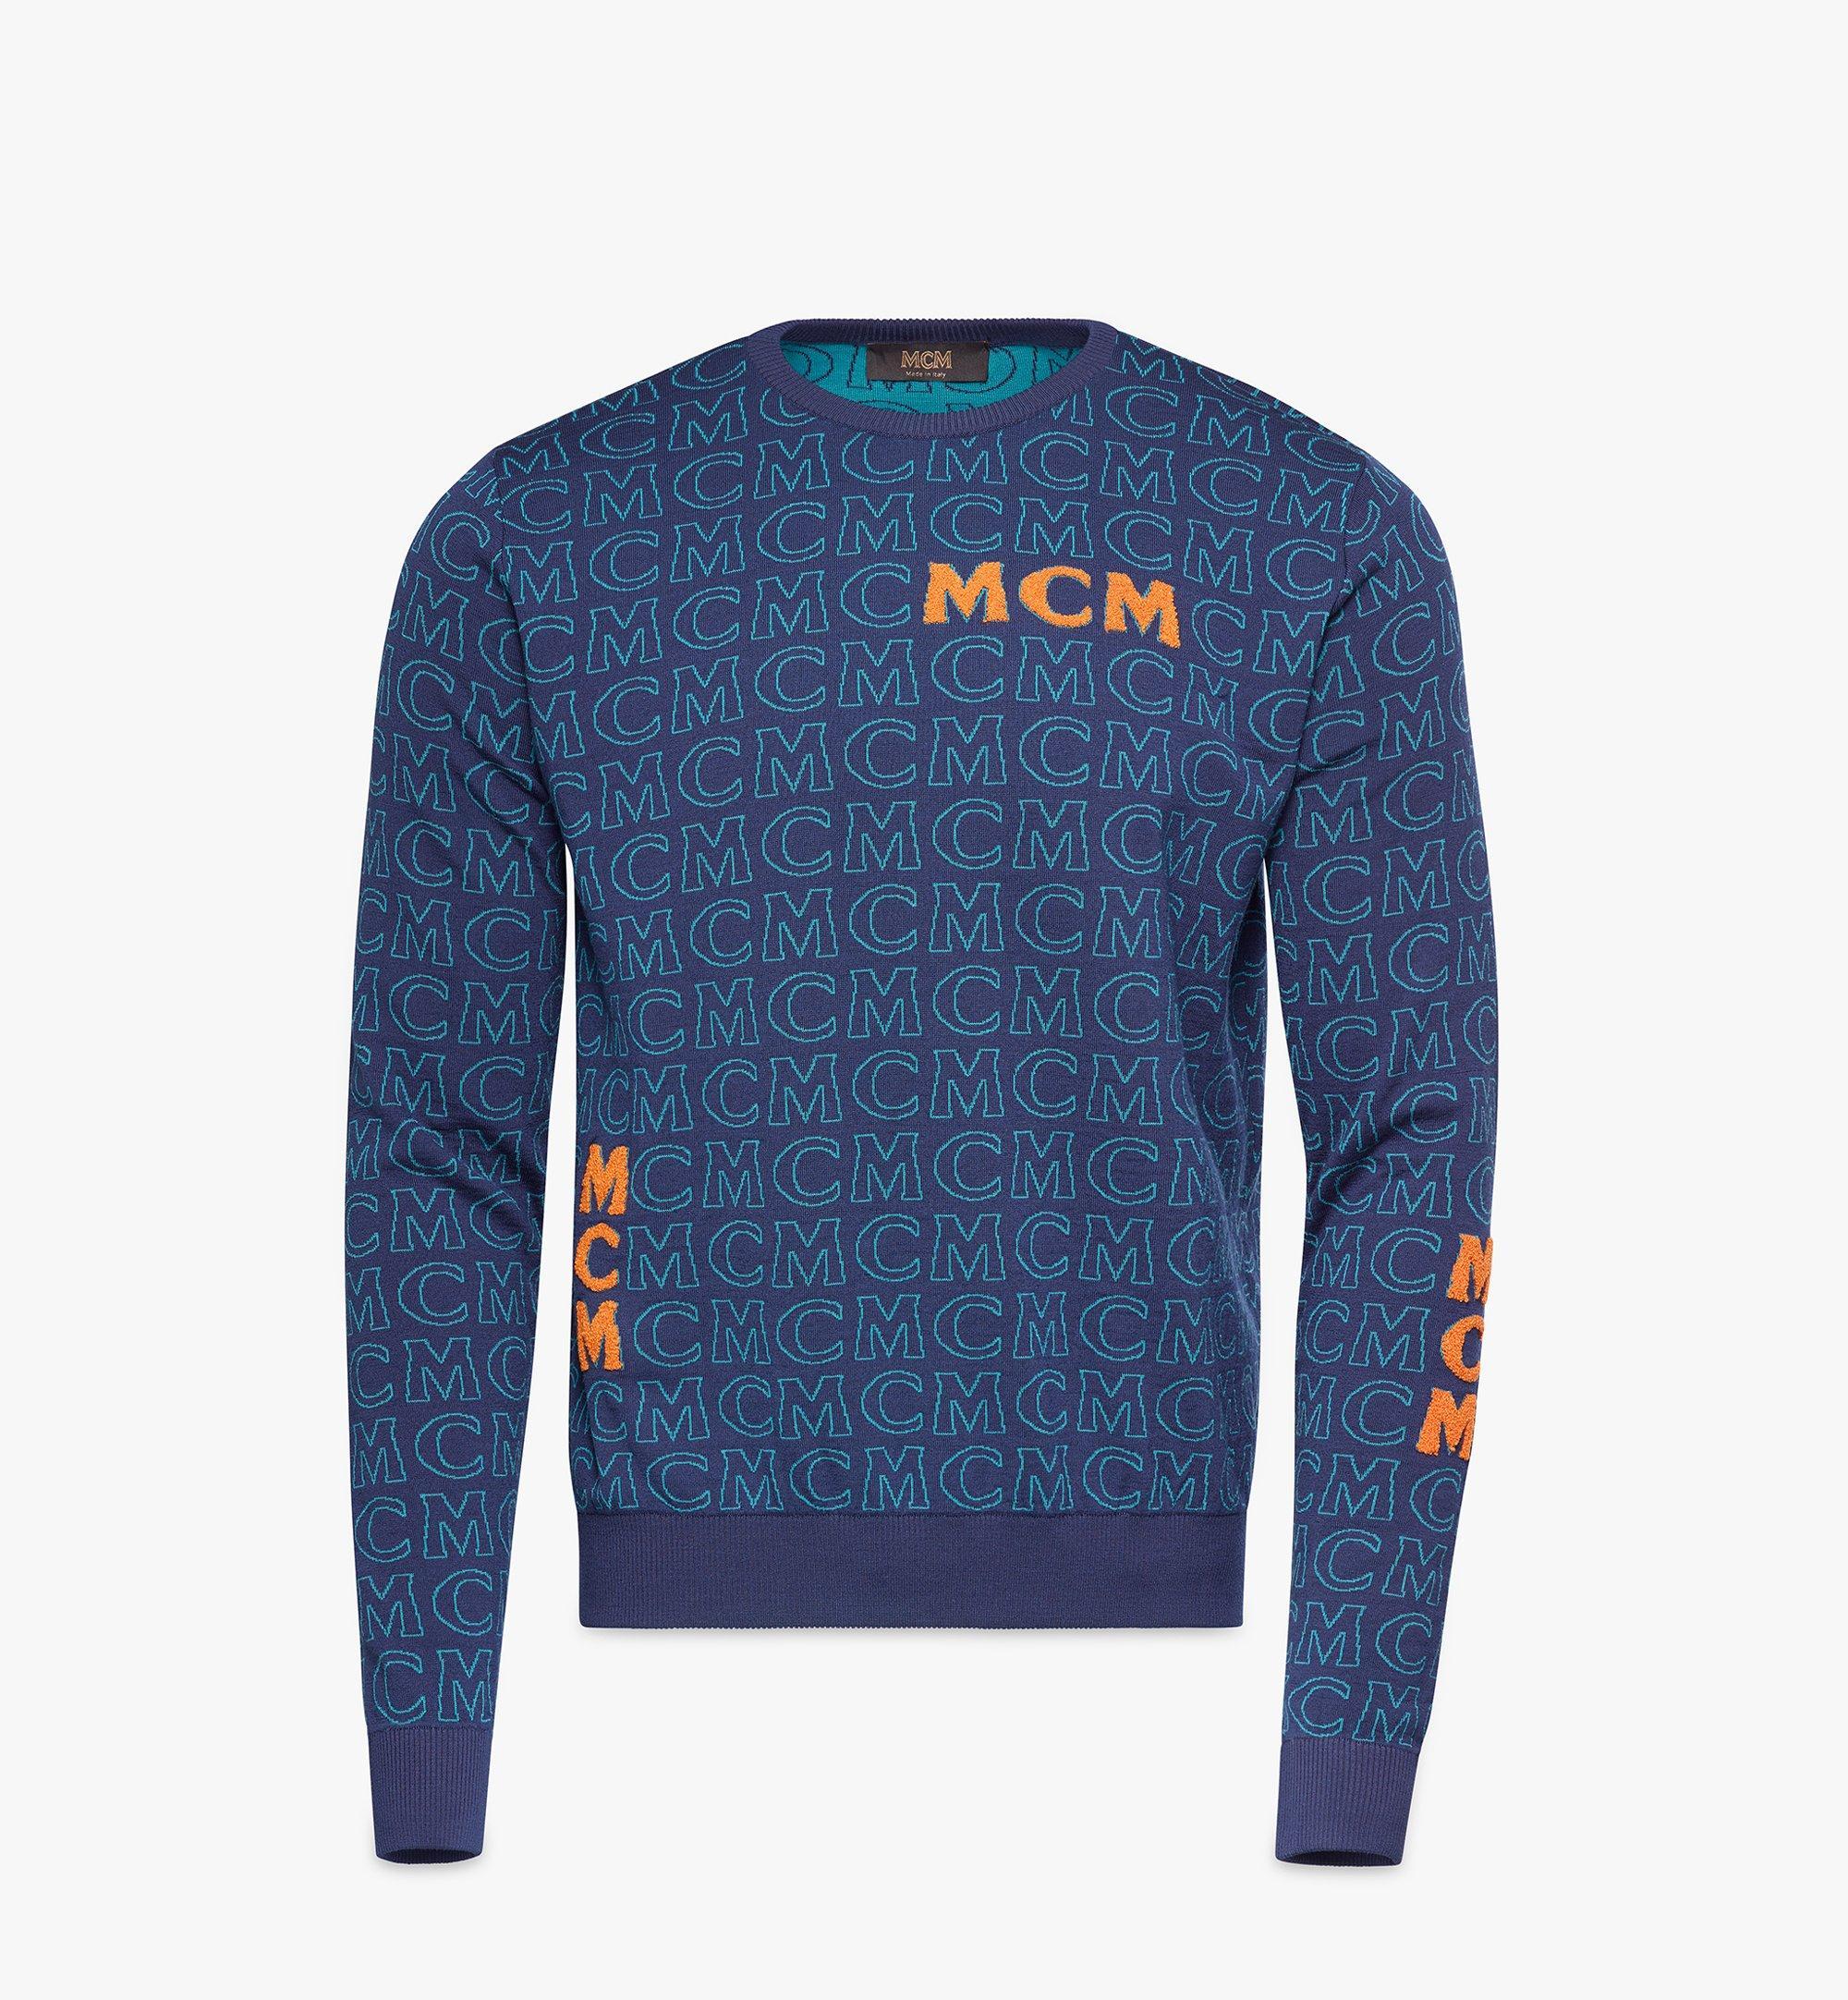 MCM メンズ モノグラム ウールセーター Black MHEAAMD01VW0XL Alternate View 1